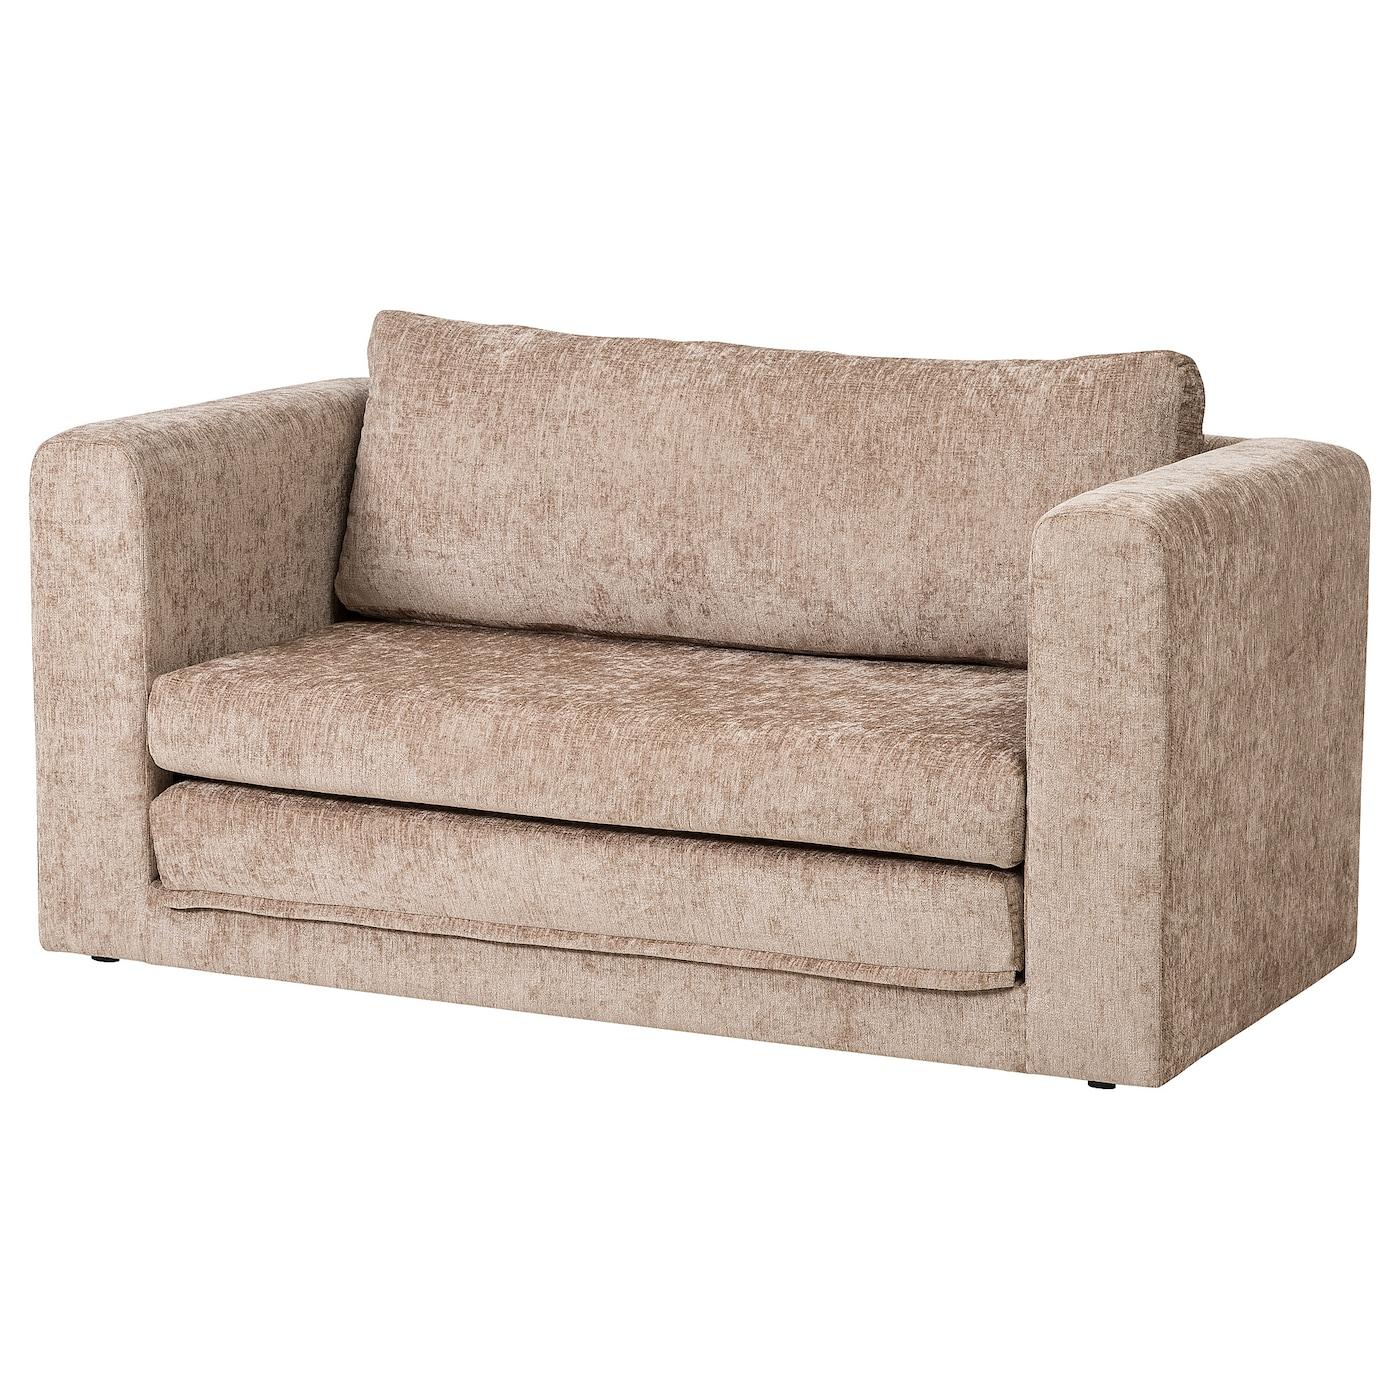 Askeby 2 Seat Sofa Bed Beige Ikea